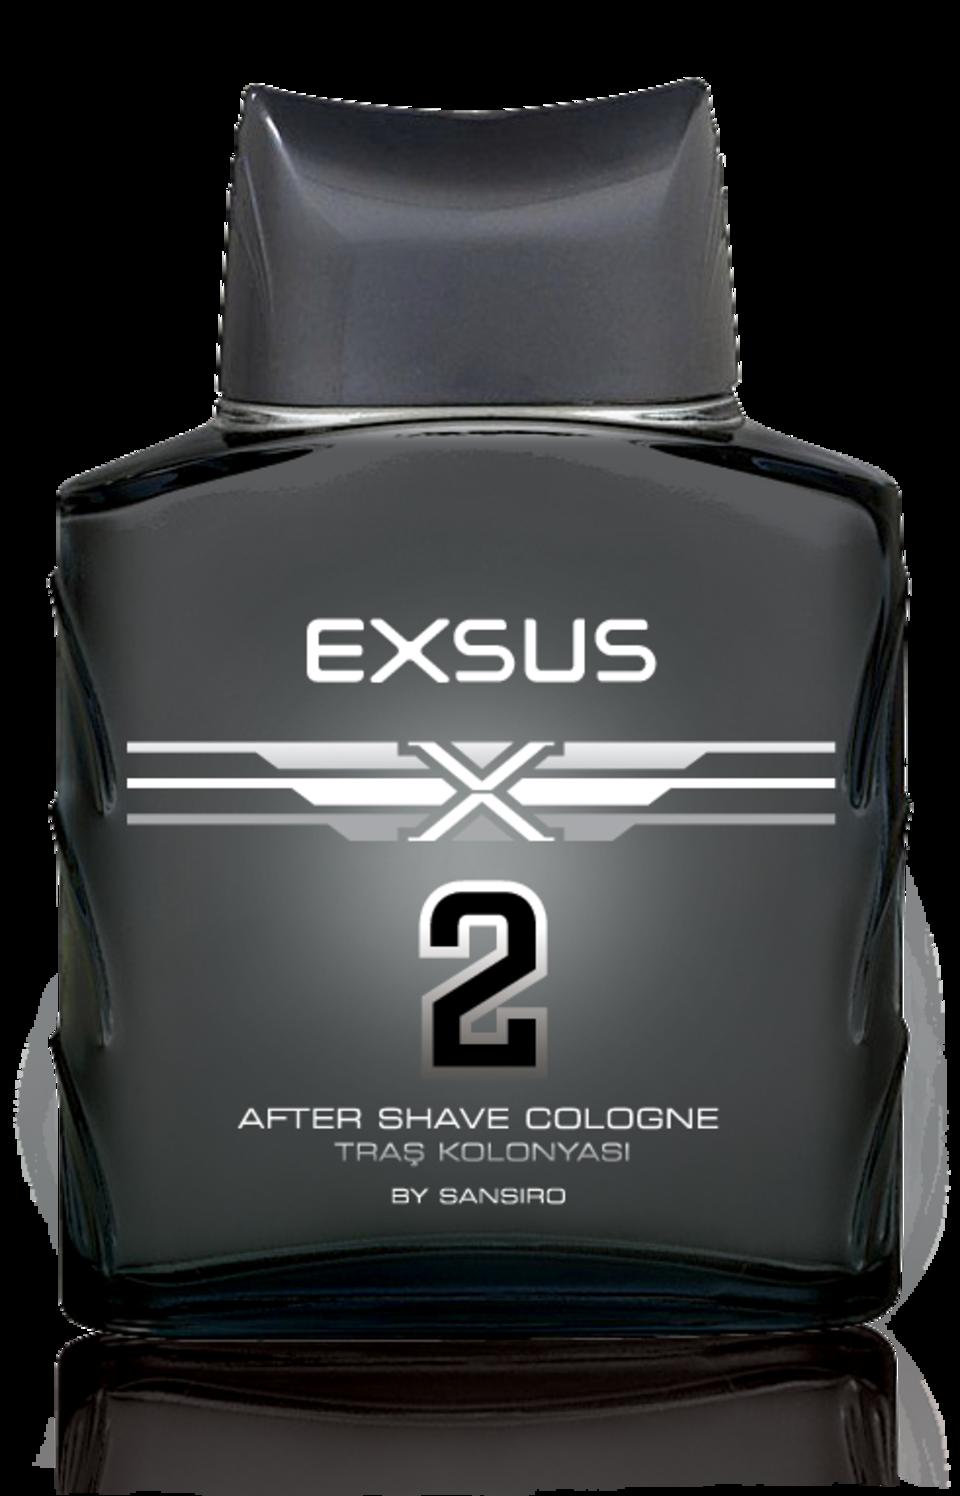 Sansiro Perfume -After Shave - Exsus 2